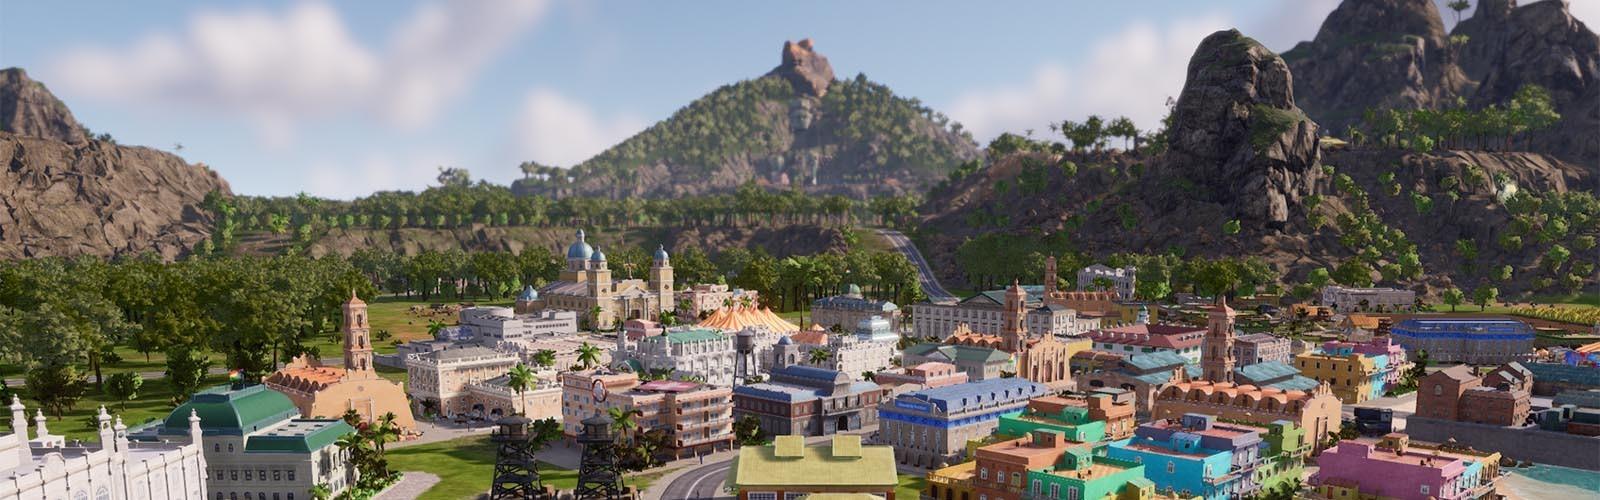 Tropico 6 - Spitter (DLC) Steam Key GLOBAL